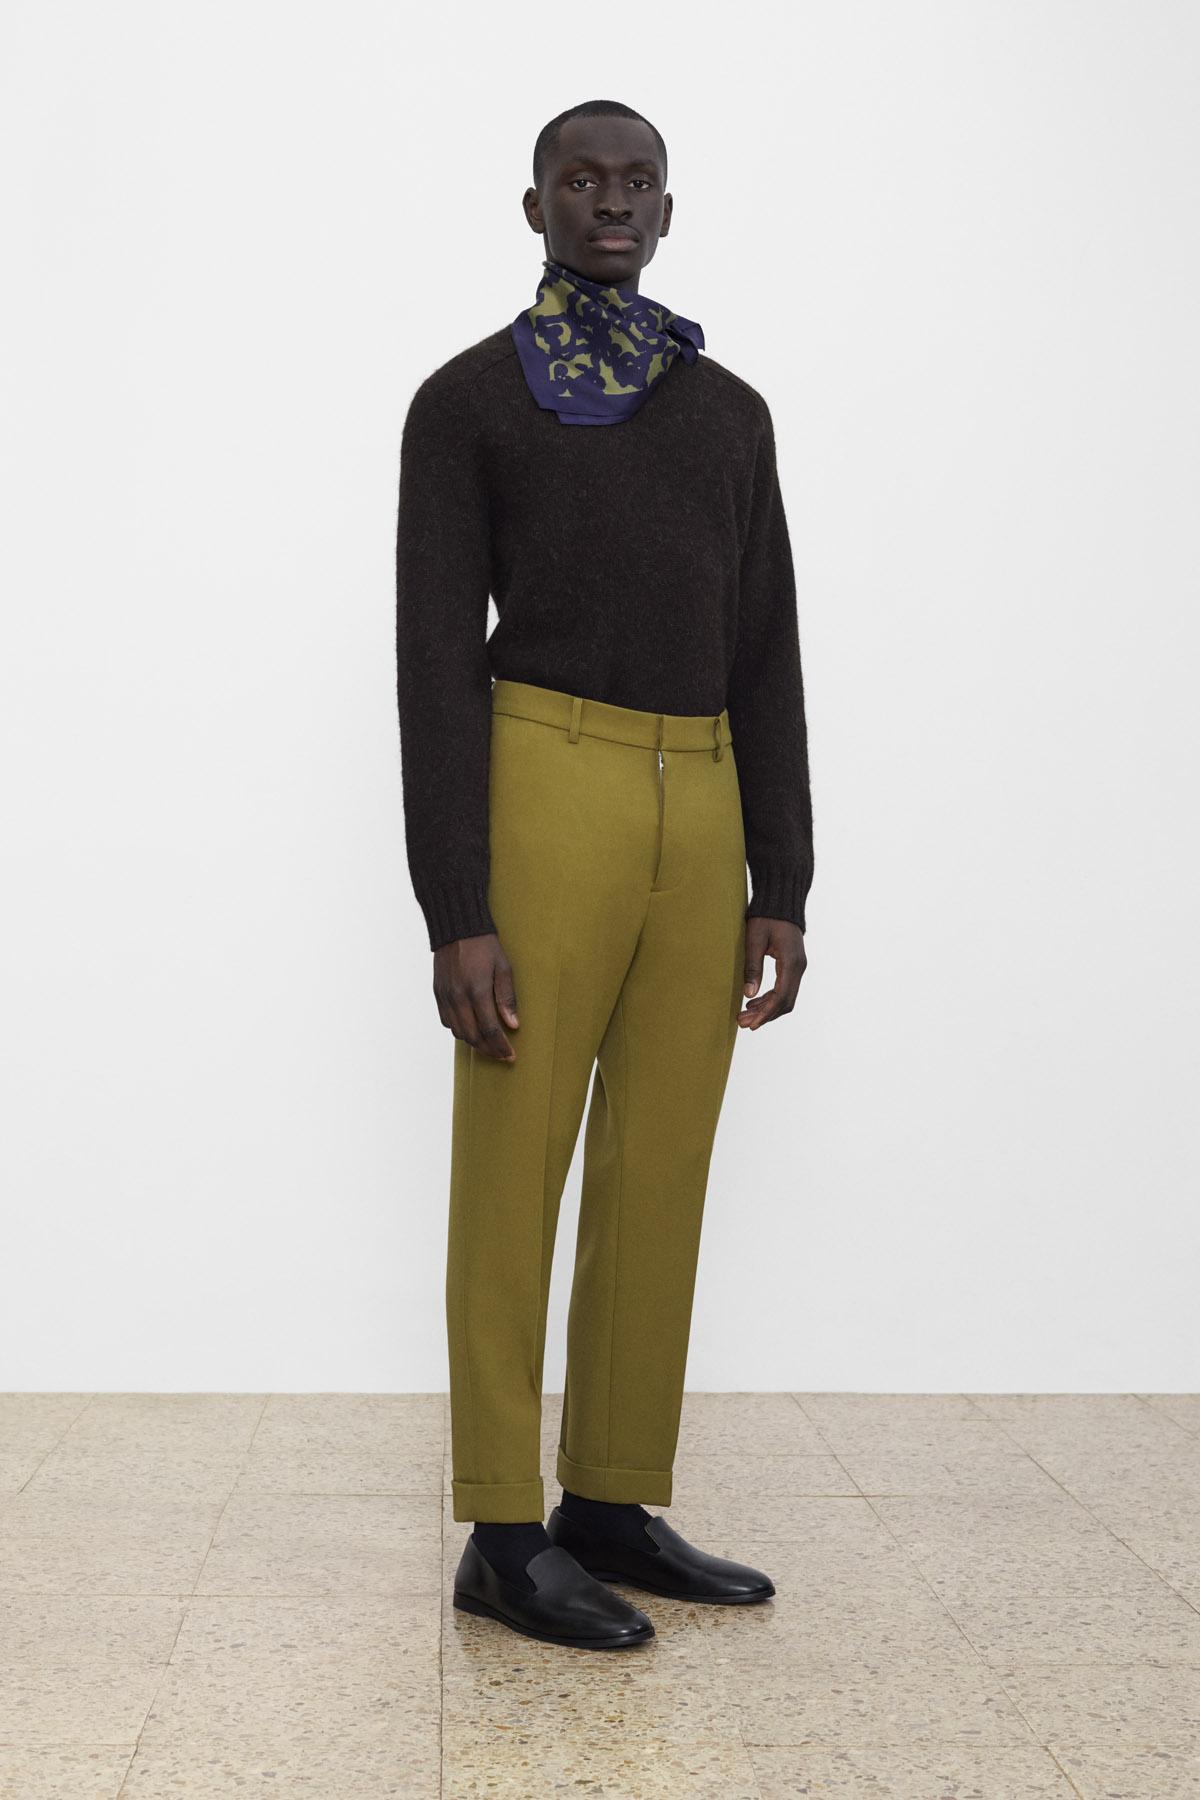 <b>4</b><br>Rocco Wool Knit Top<br>Richard Wool Pants<br>Printed Silk Scarf